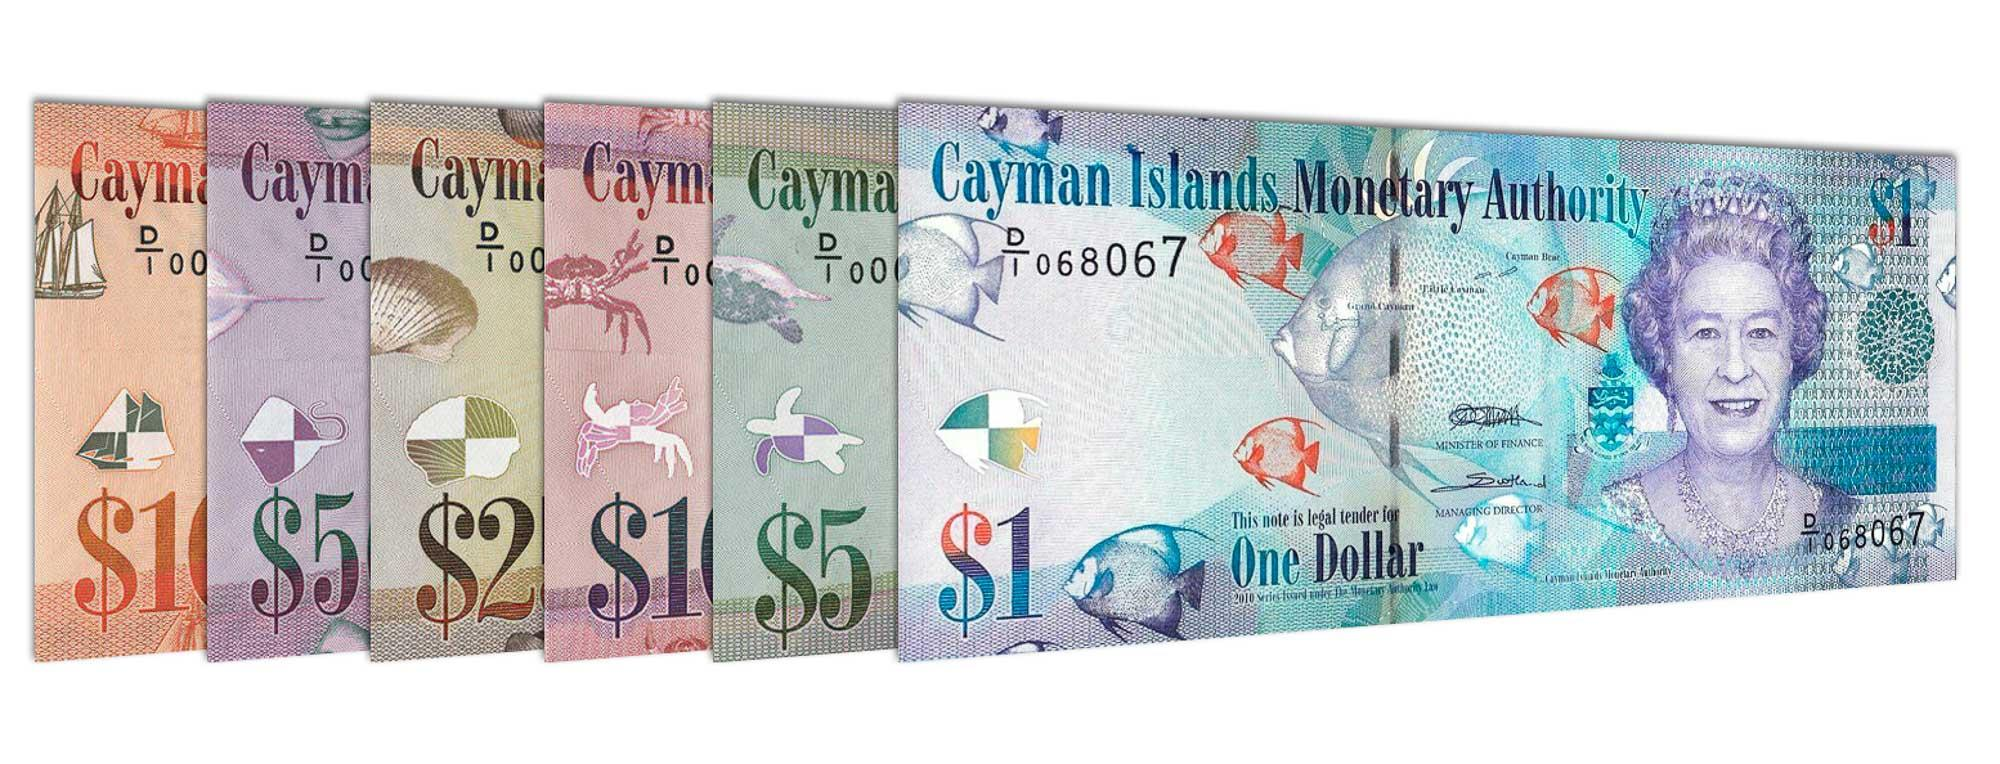 Cayman Islands dollars